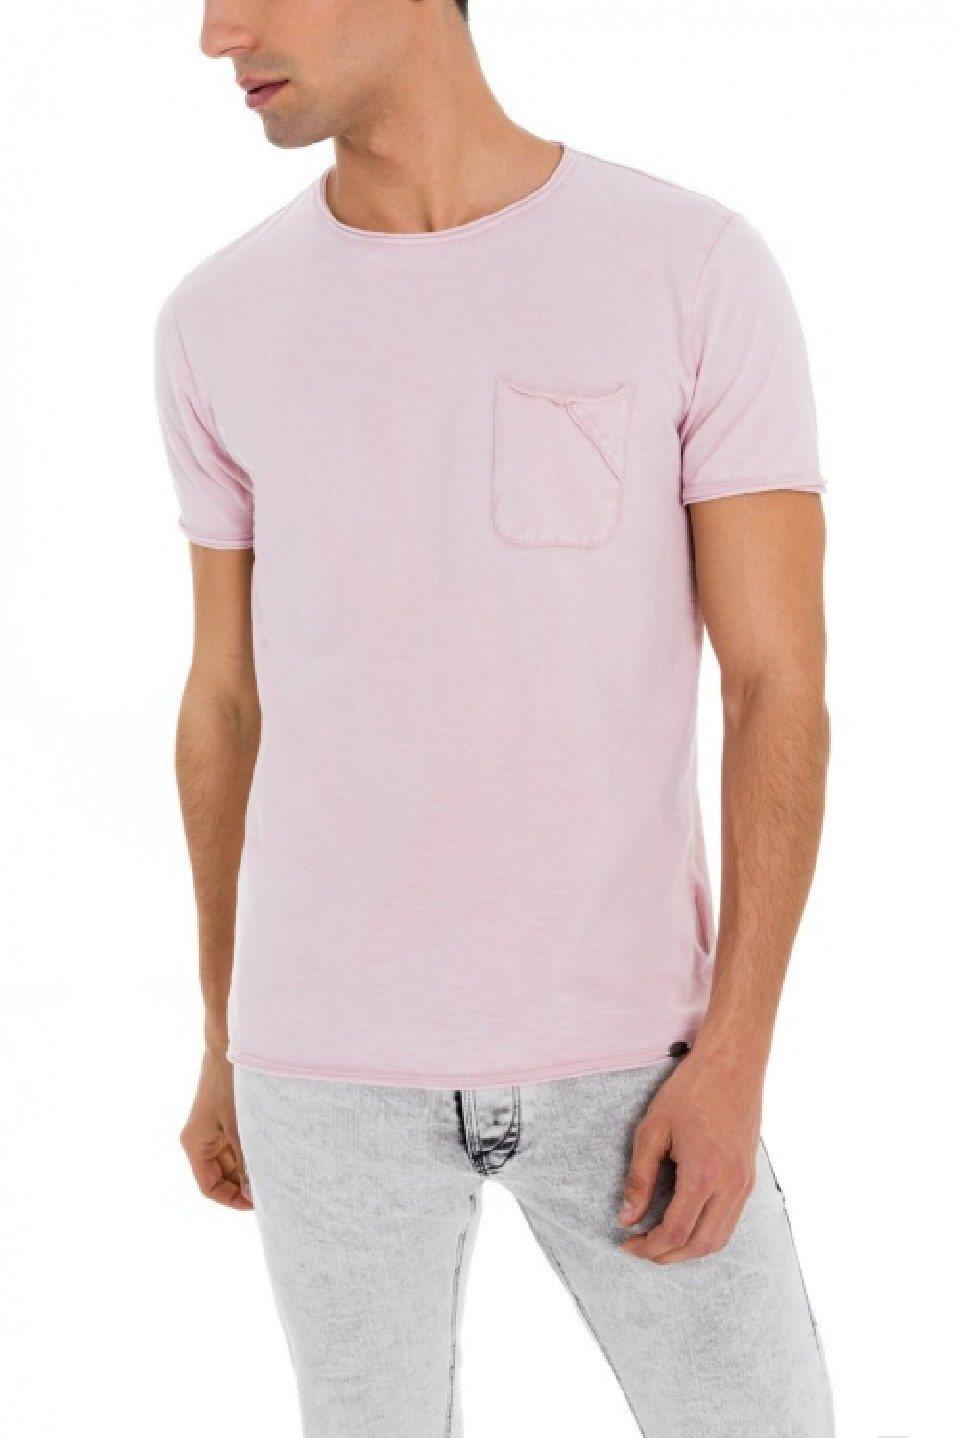 Herren salsa jeans T-Shirt, kurzarm PALM BEACH blau, gelb, grau, grün, rosa, schwarz, weiß | 05604562888271